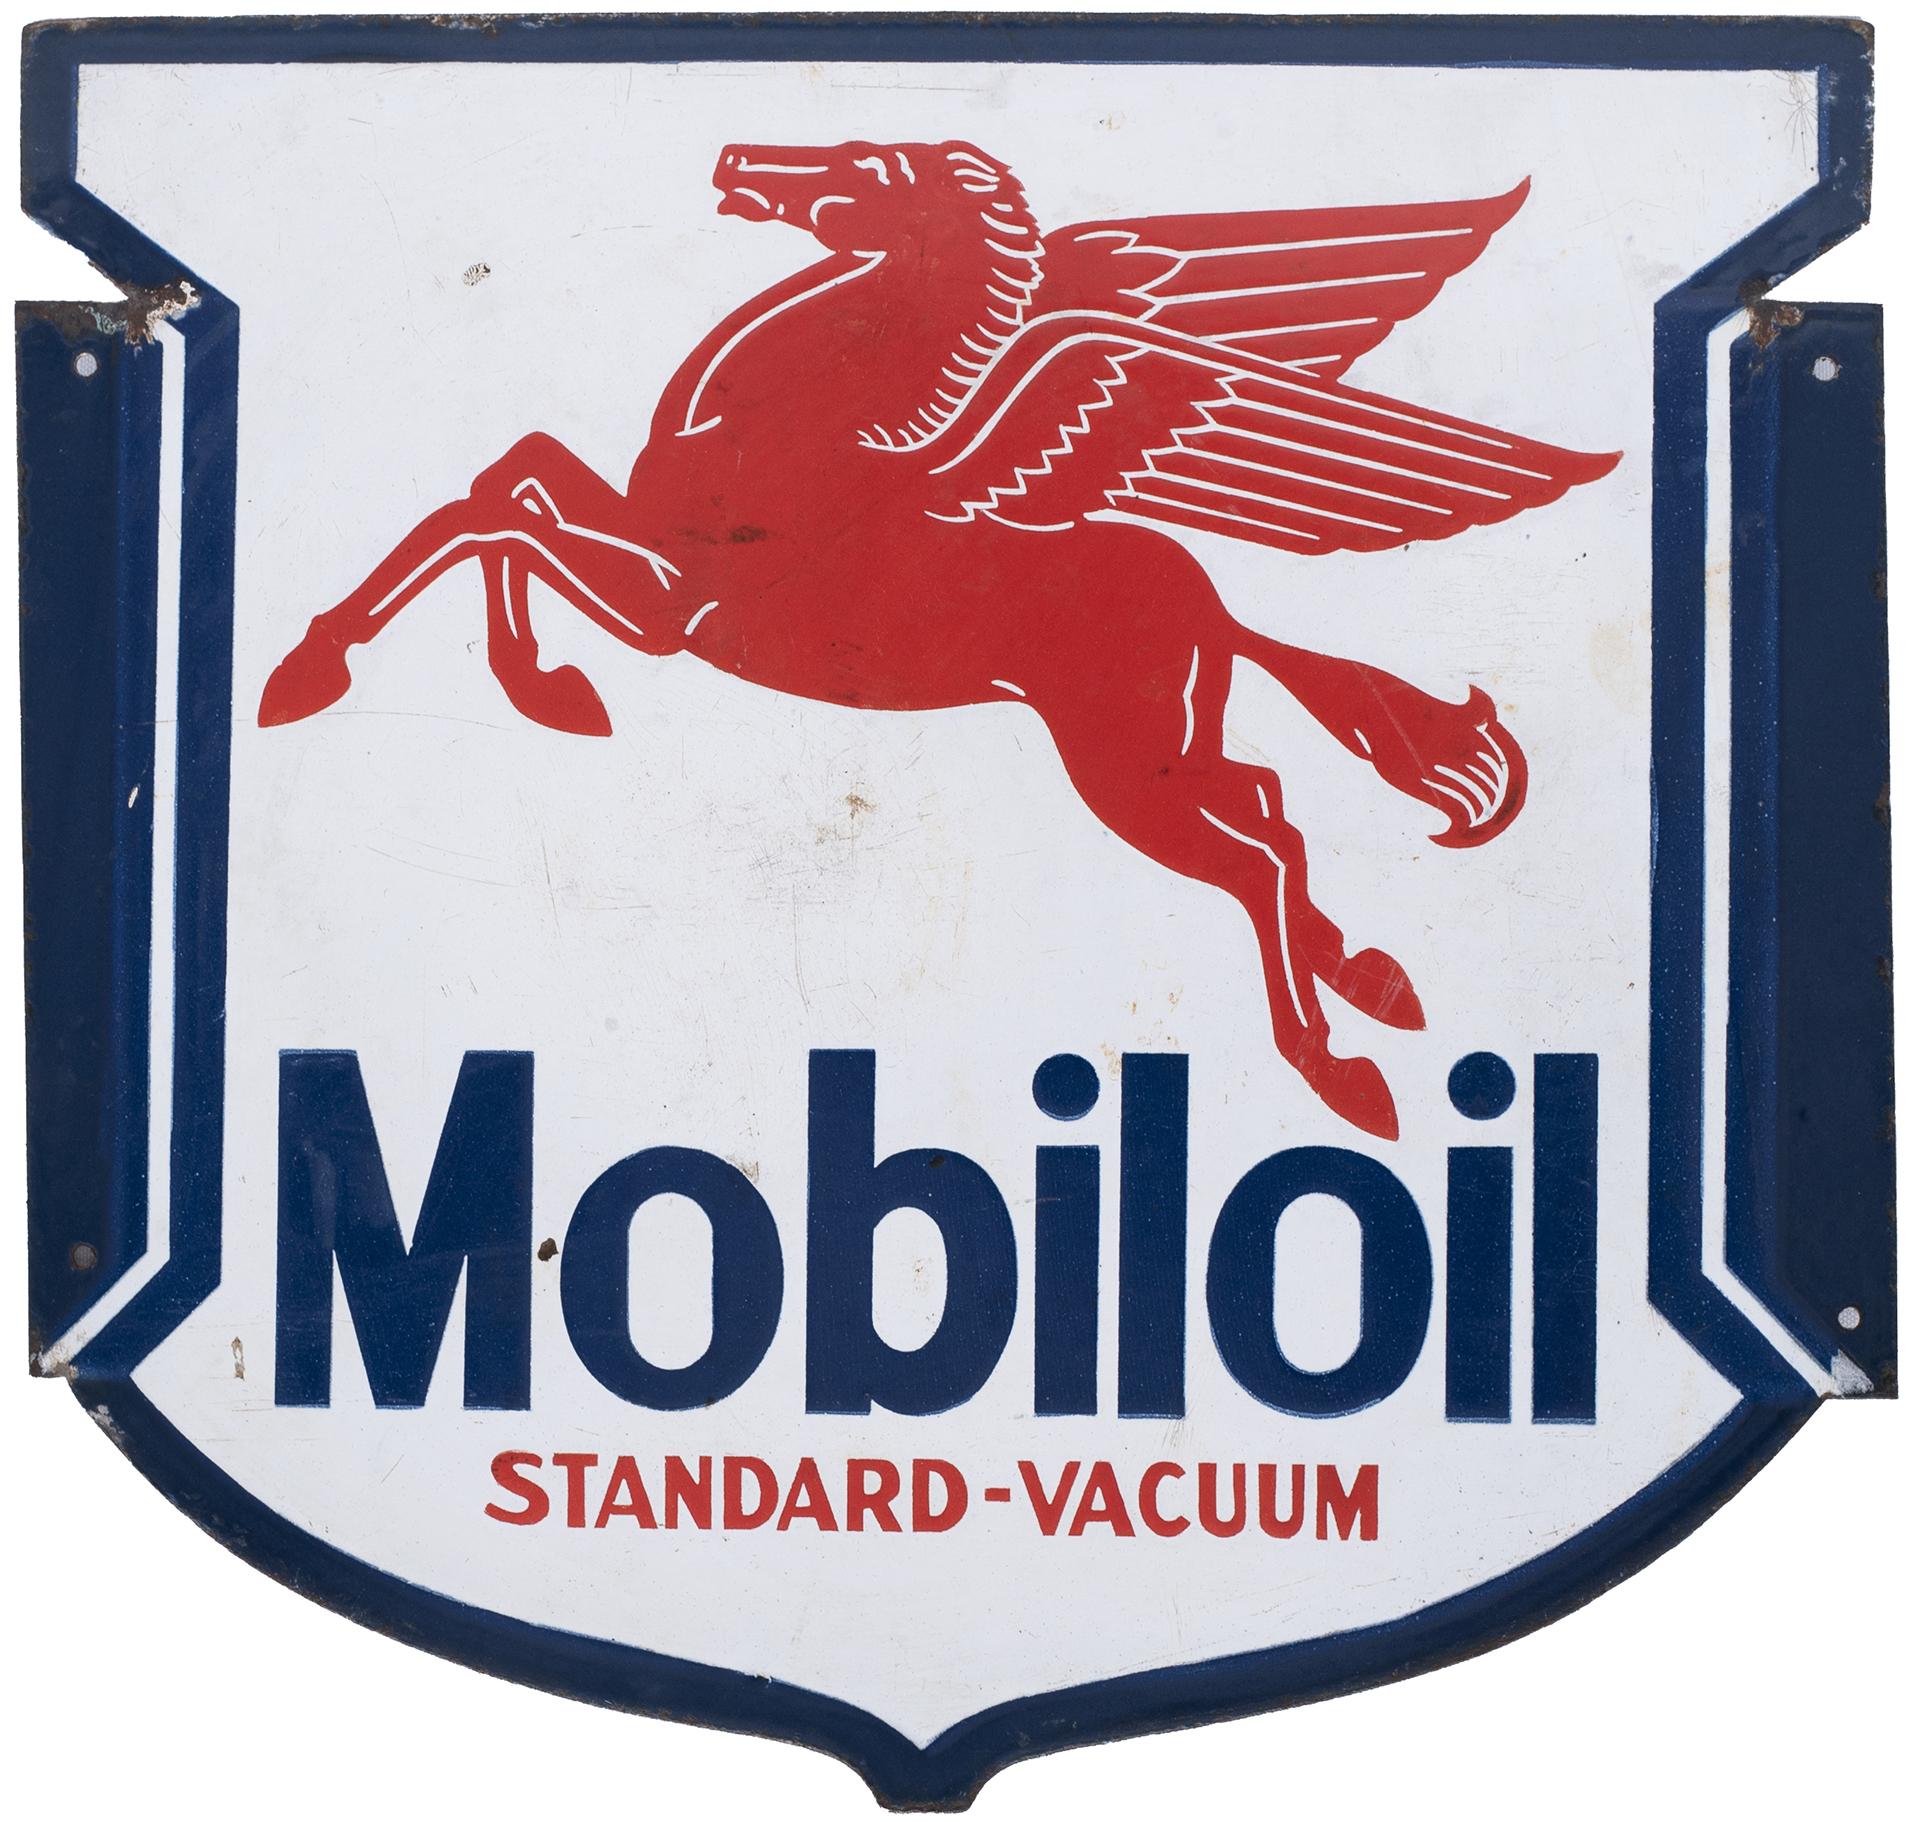 Advertising enamel motoring sign MOBILOIL STANDARD-VACUUM. Double sided, both sides in very good